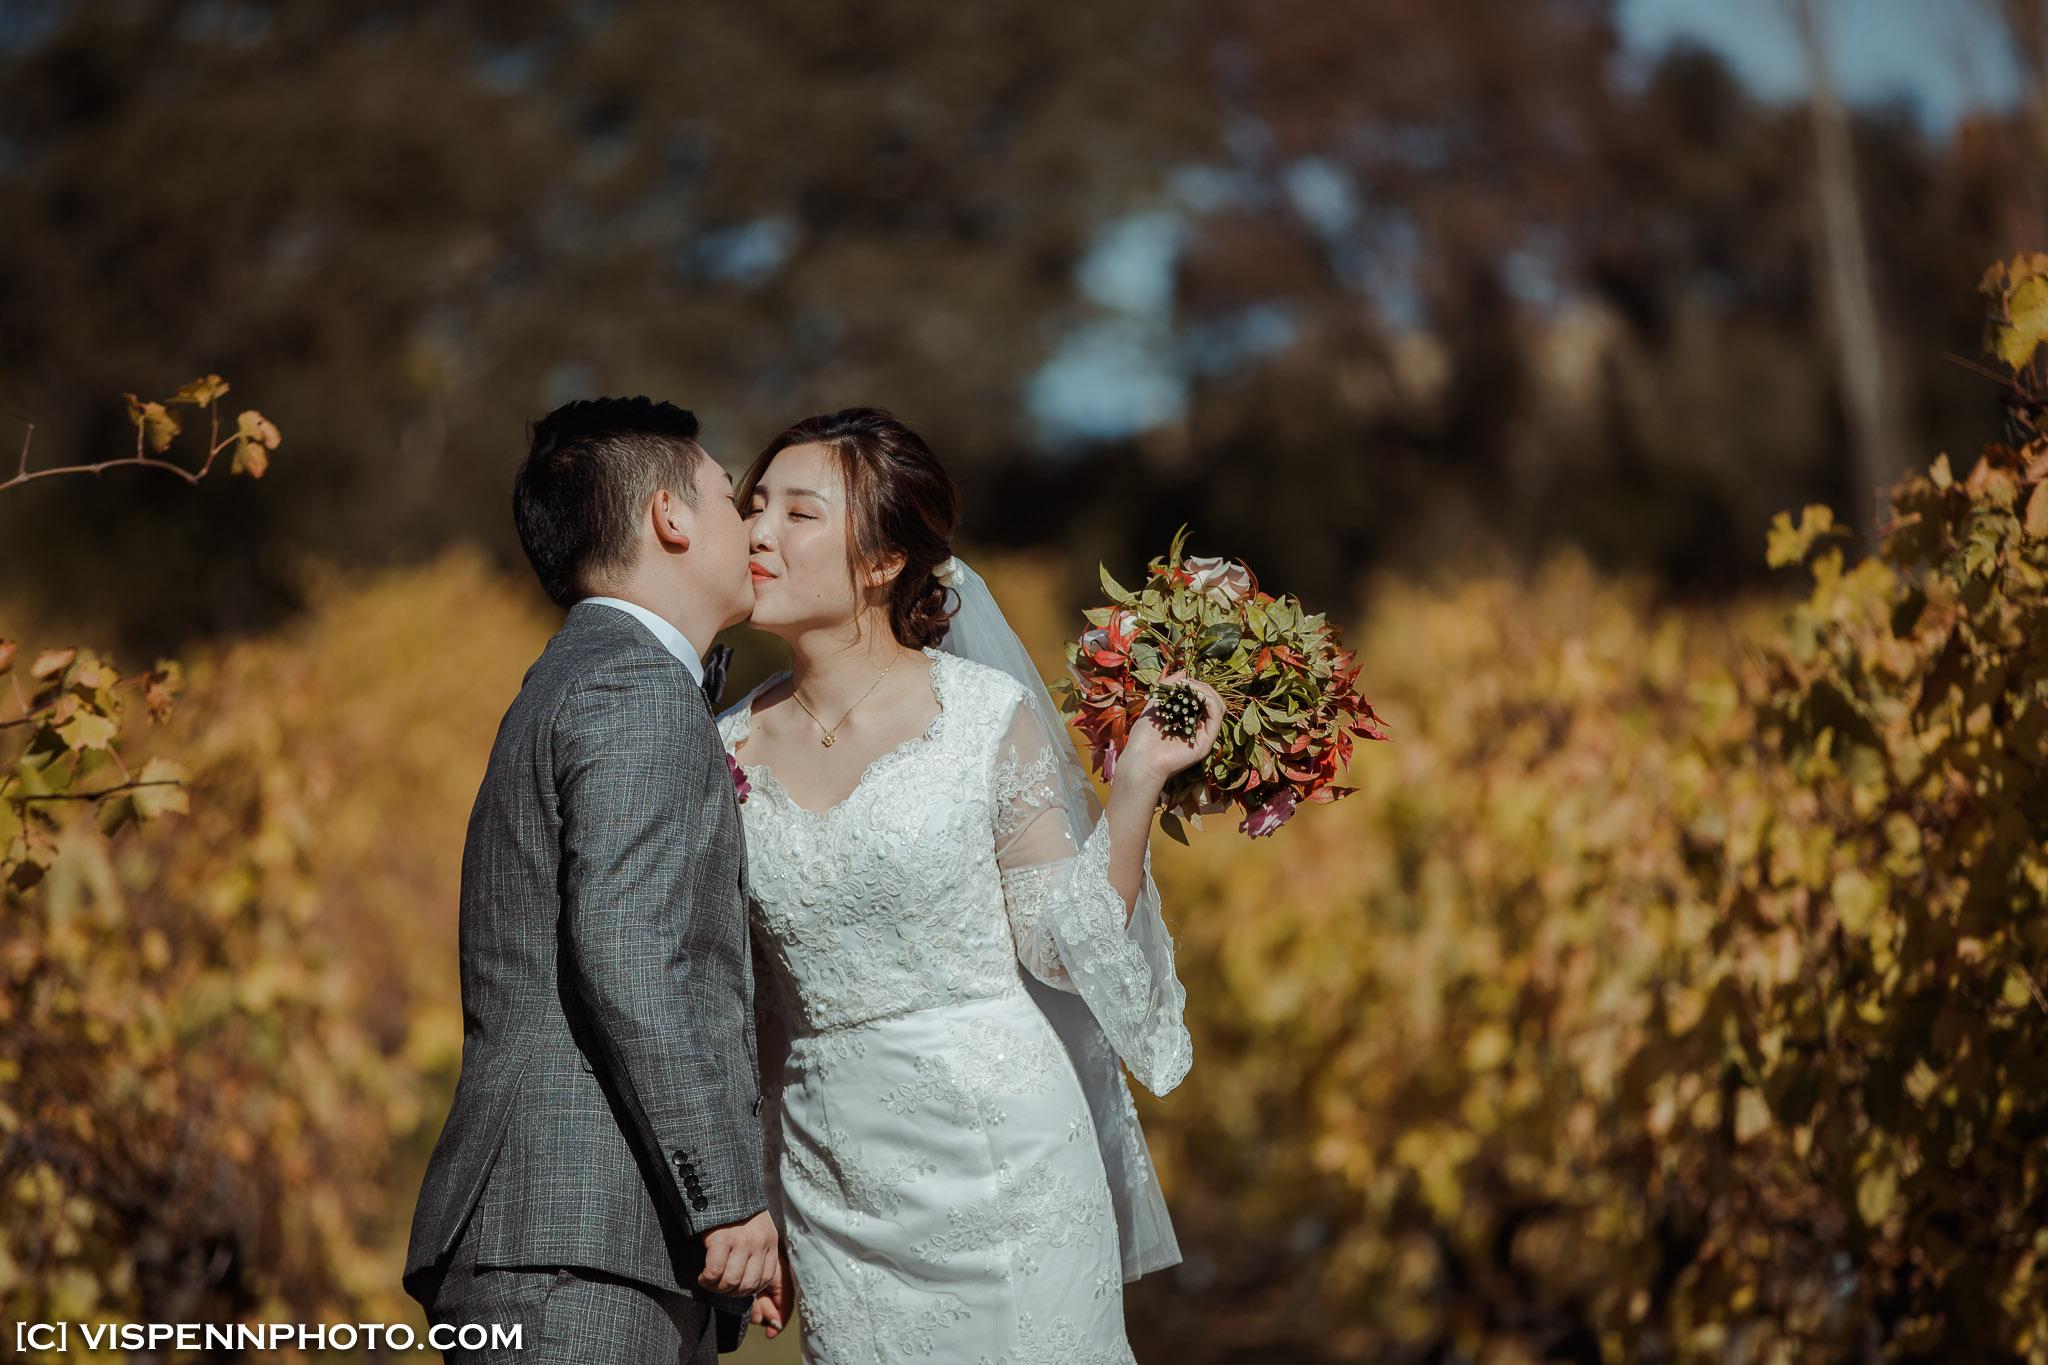 WEDDING DAY Photography Melbourne DominicHelen 2P 5965 1DX2 ZHPENN